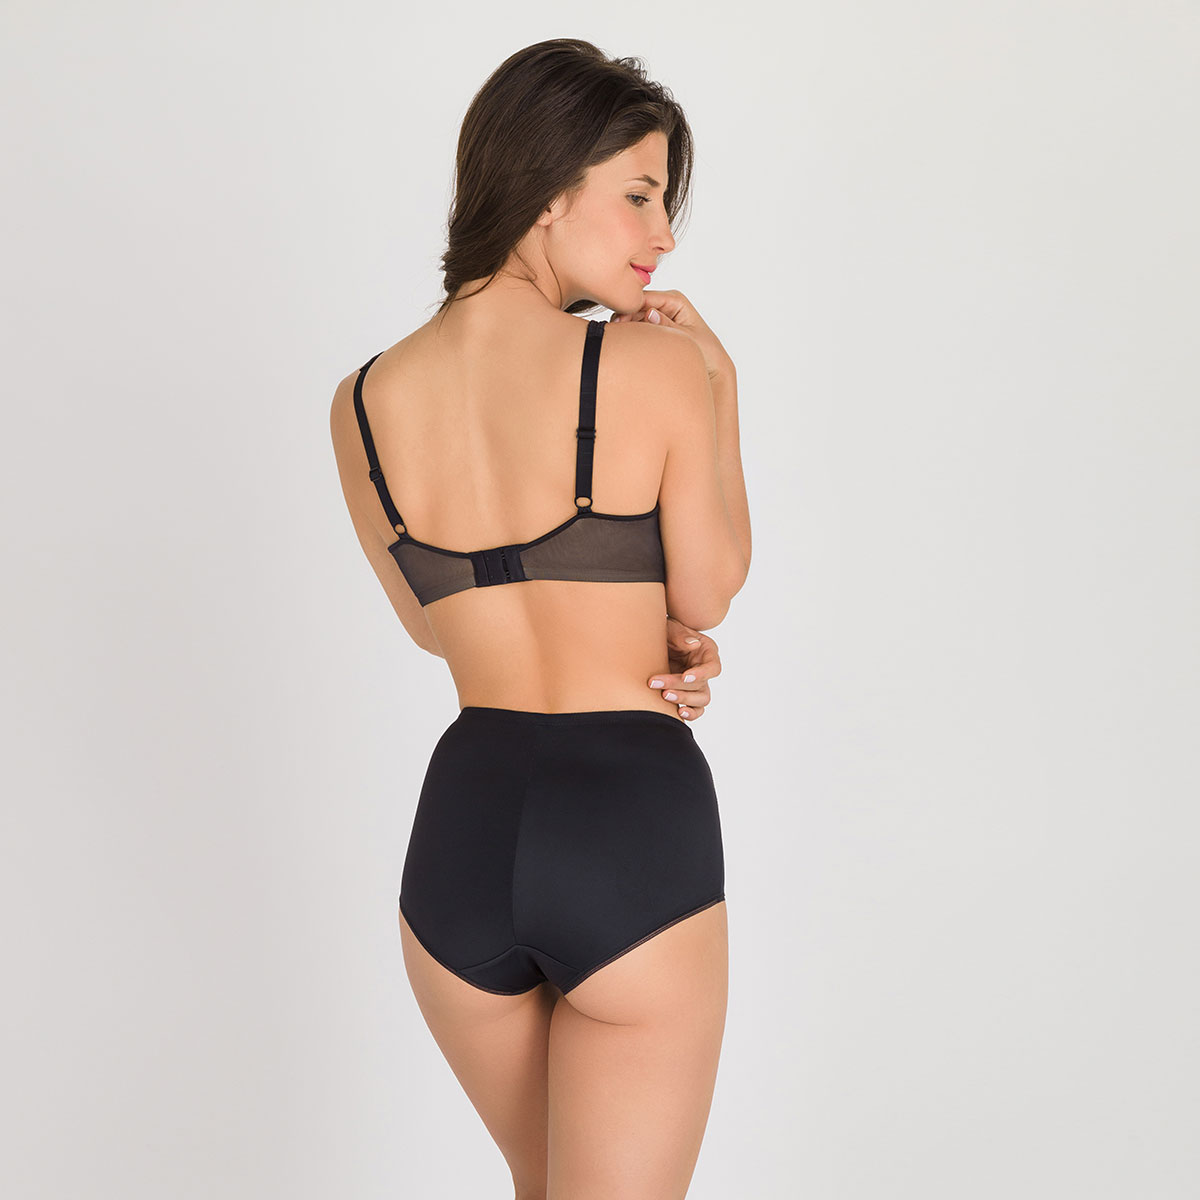 Culotte Maxi noire – Expert in Silhouette Feminine-PLAYTEX